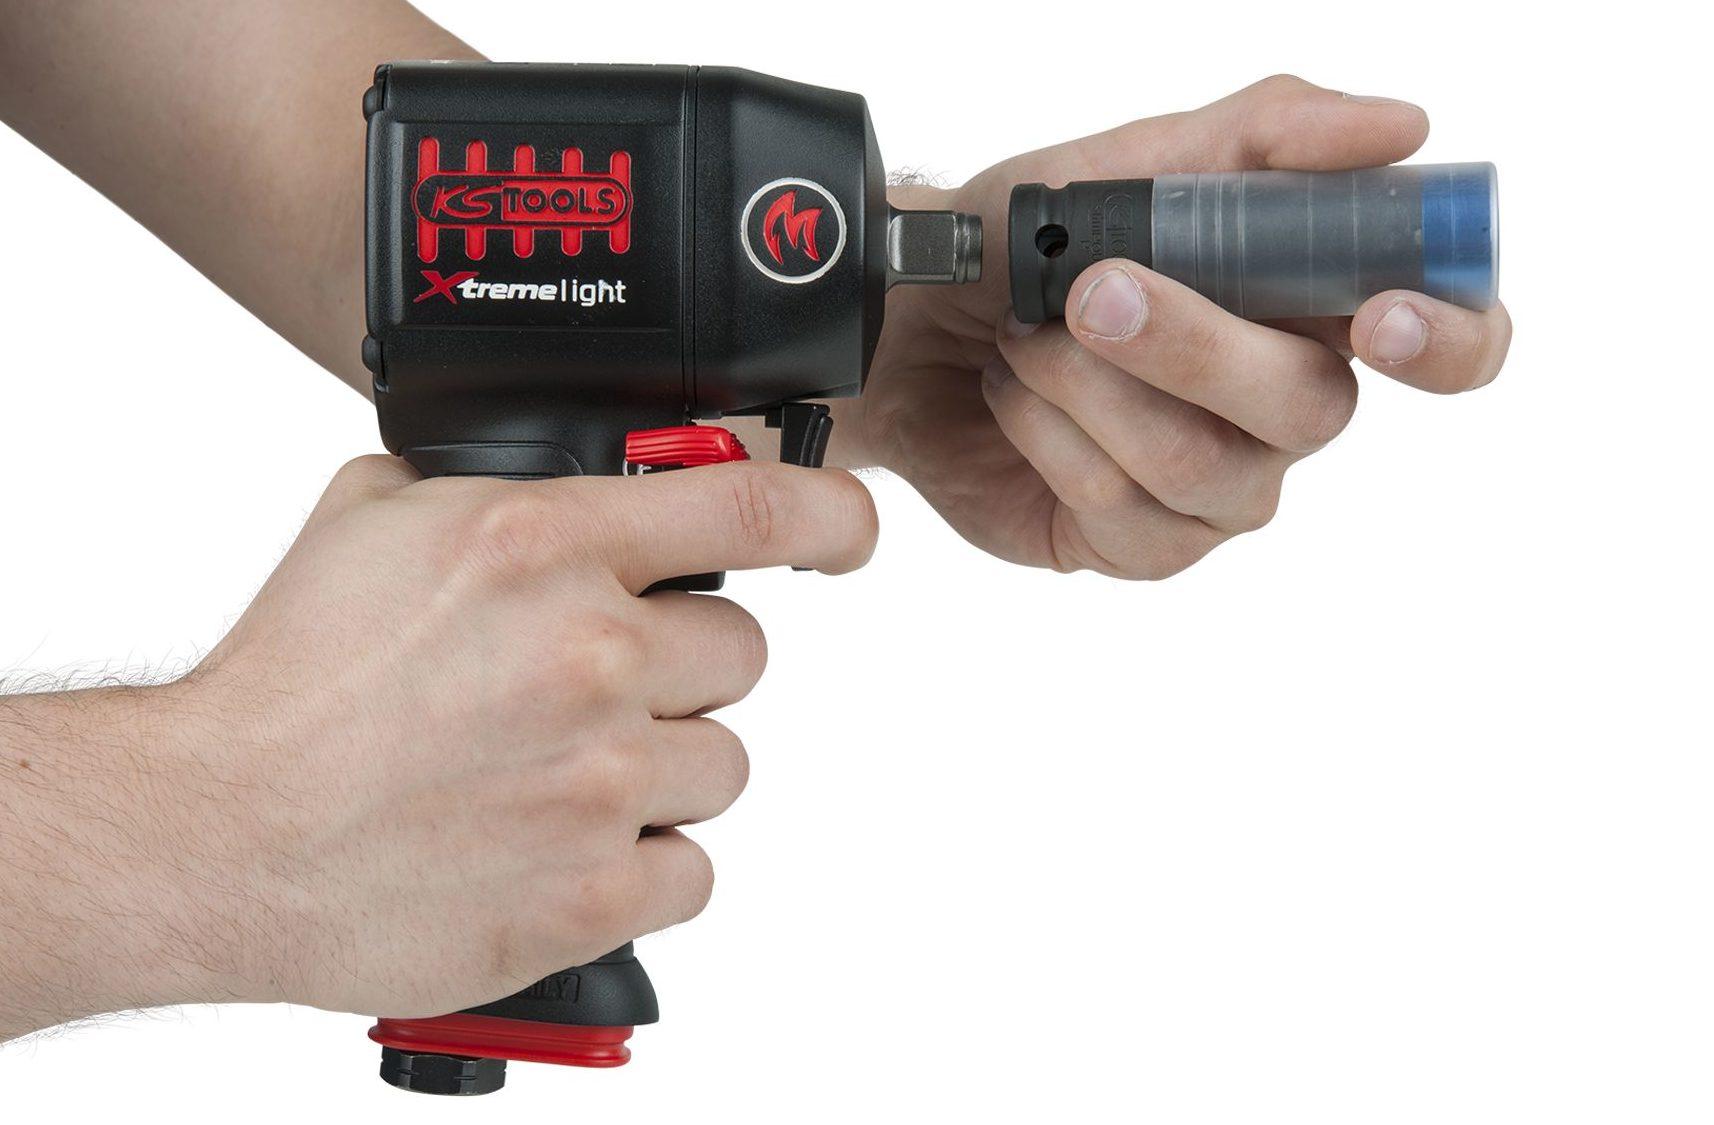 Schlagschrauber miniMONSTER Xtreme light KS Tools